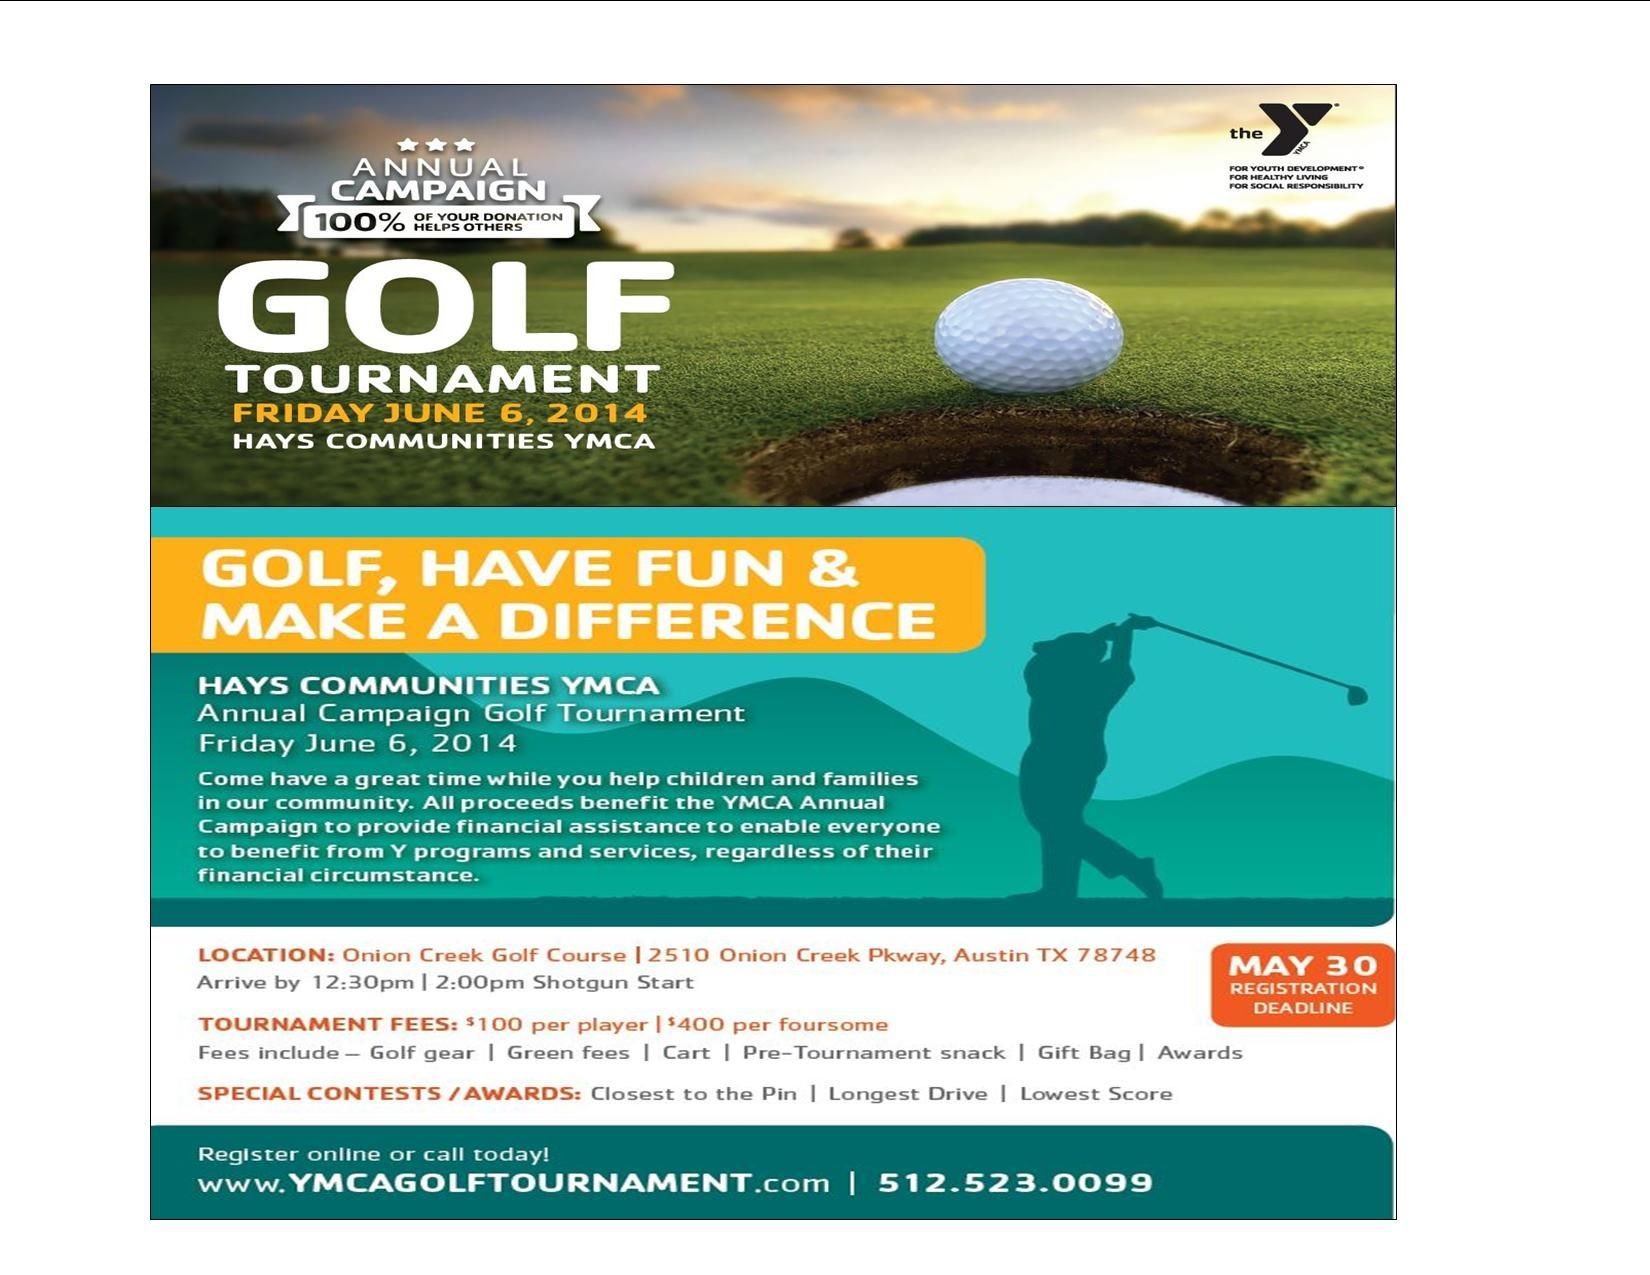 Hays Communities YMCA Annual Campaign Golf Tournament - Buda, TX